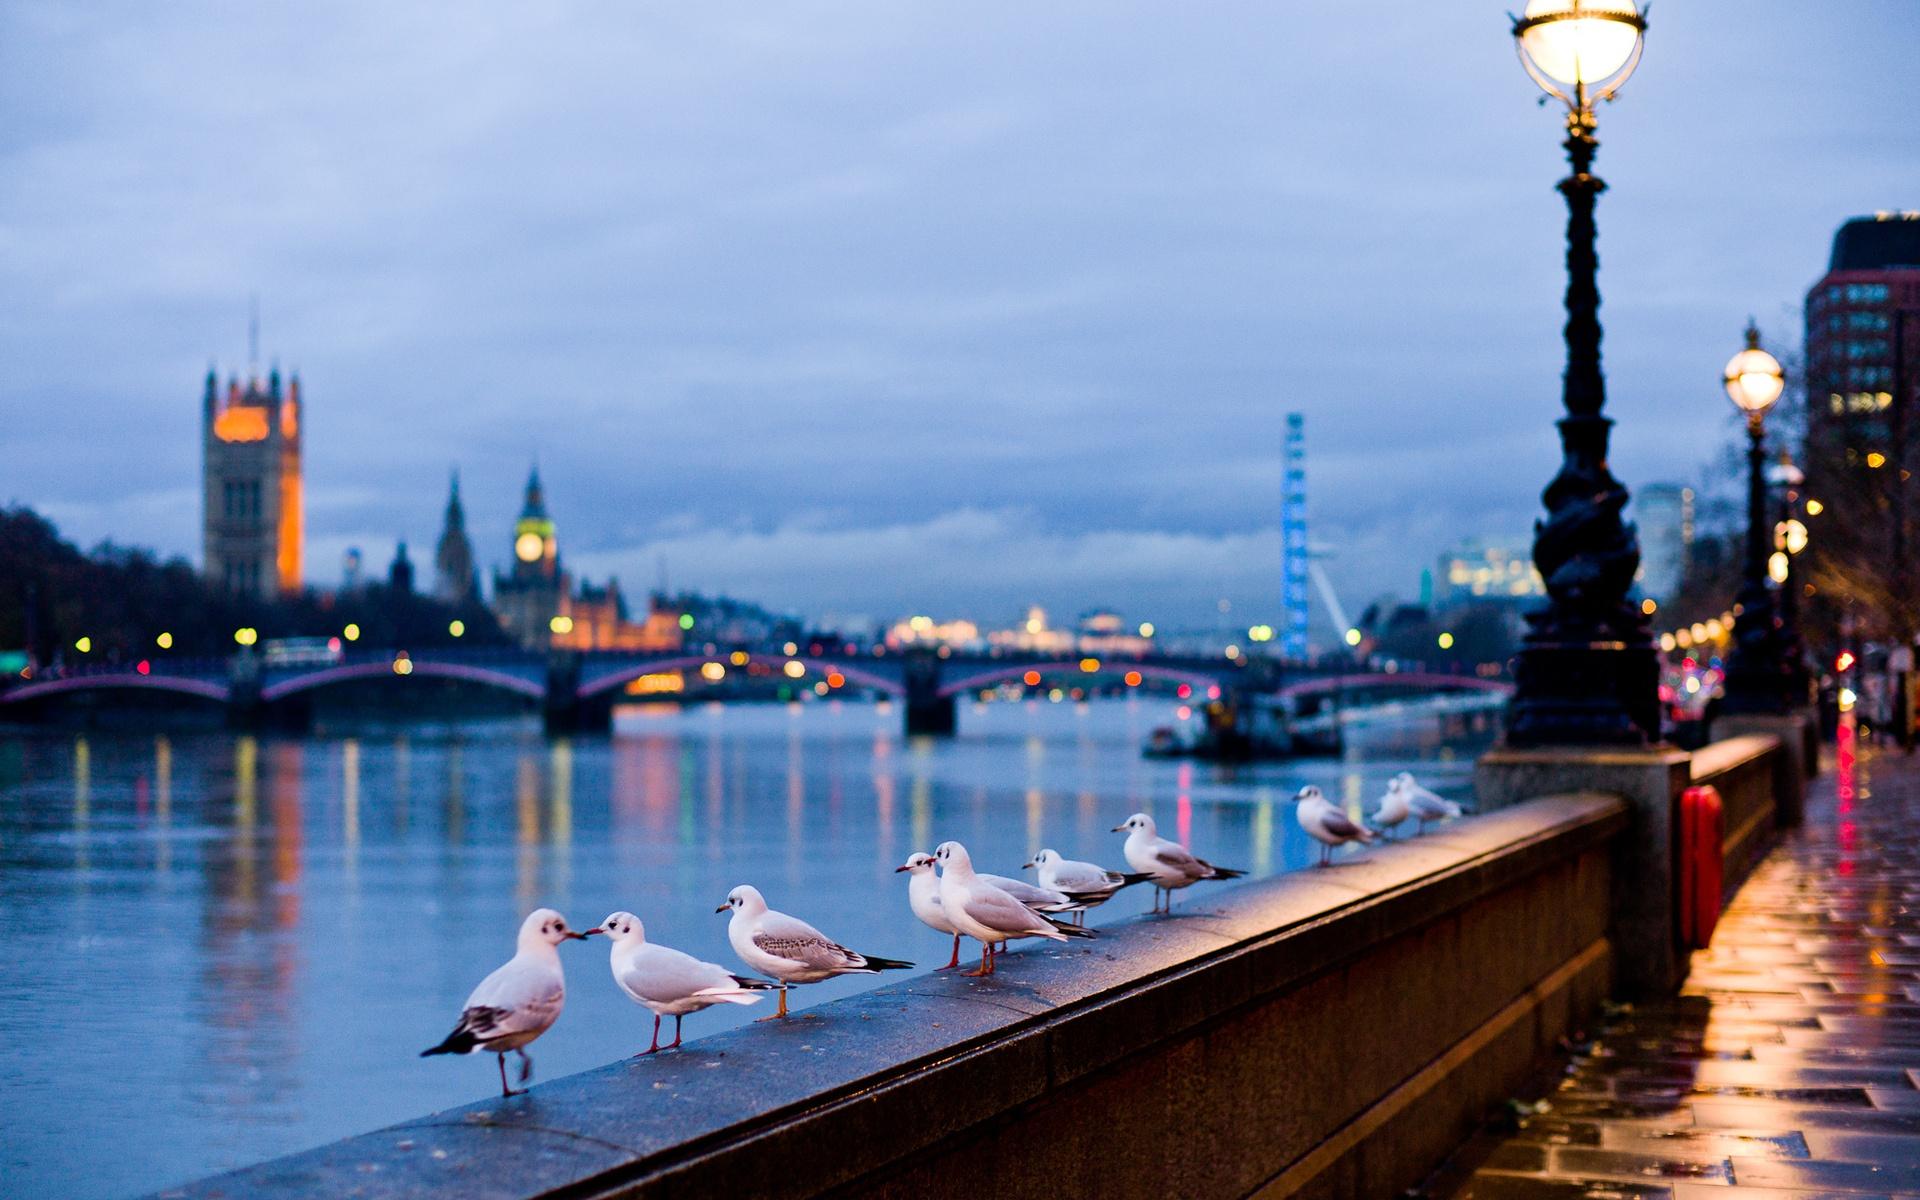 london city wallpapers - photo #36